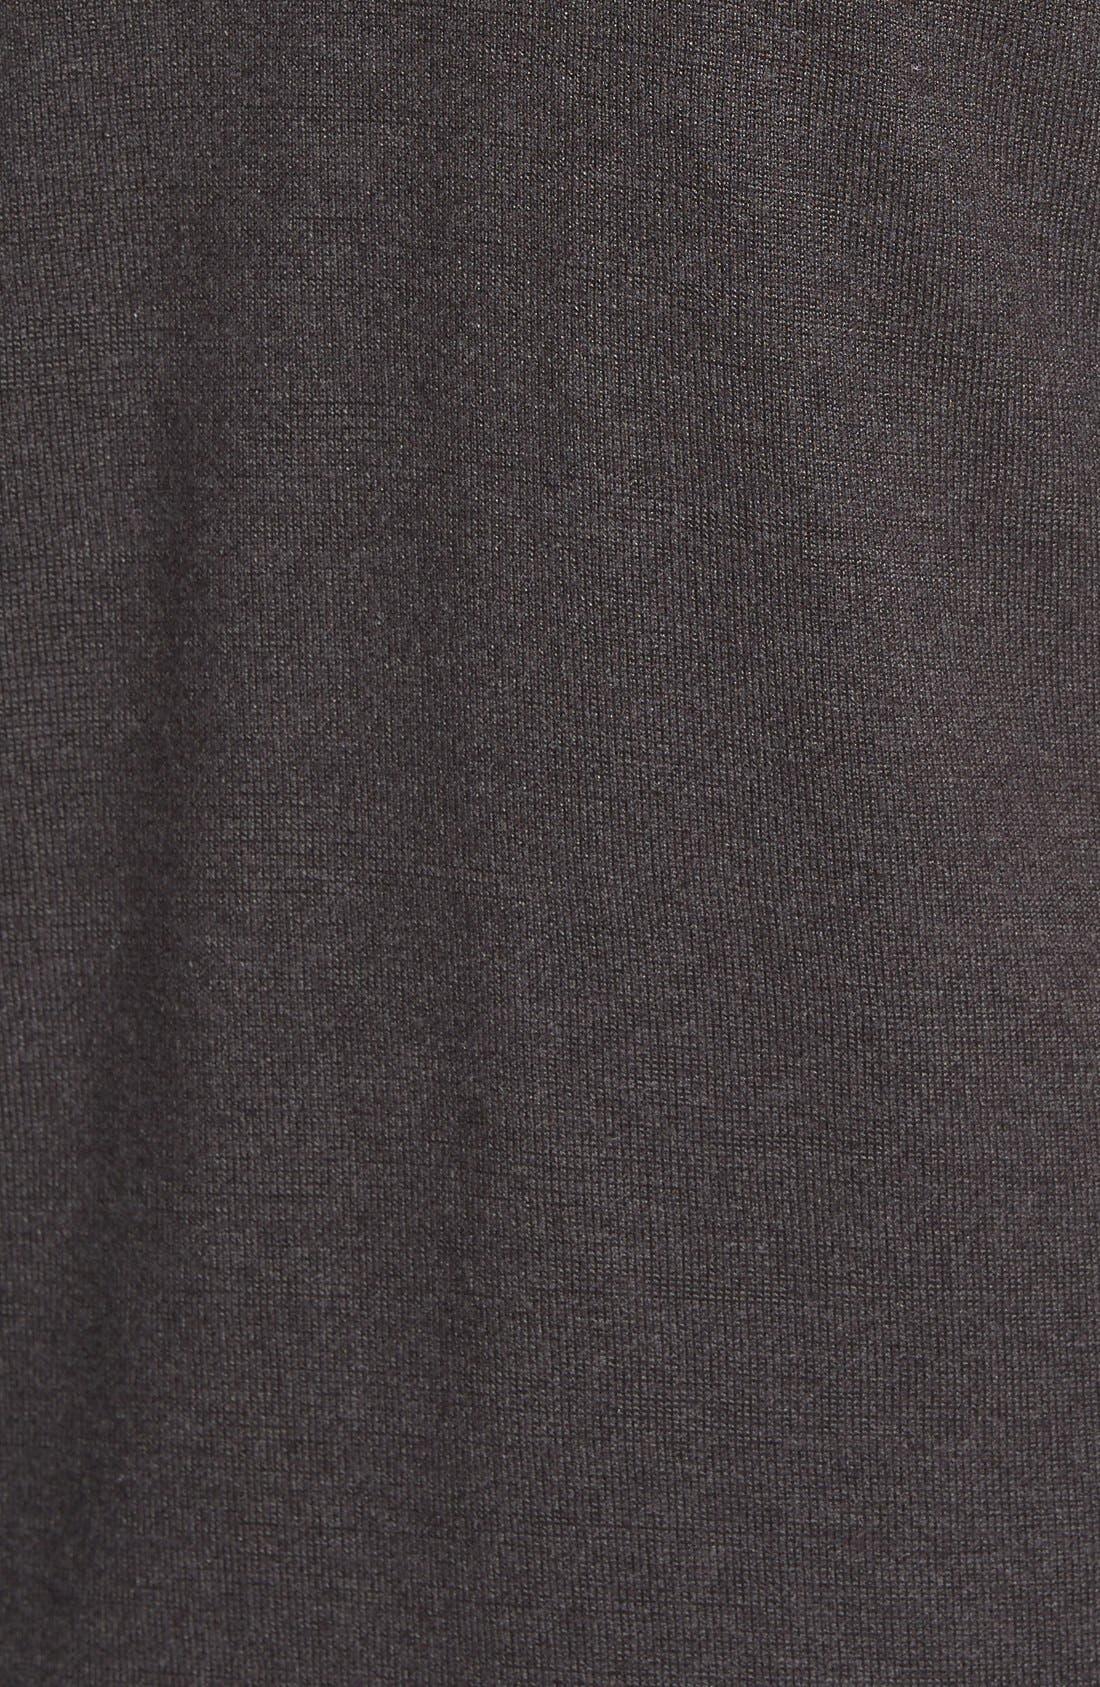 Alternate Image 3  - NIC+ZOE 'Parker' Colorblock Cardigan (Regular & Petite)